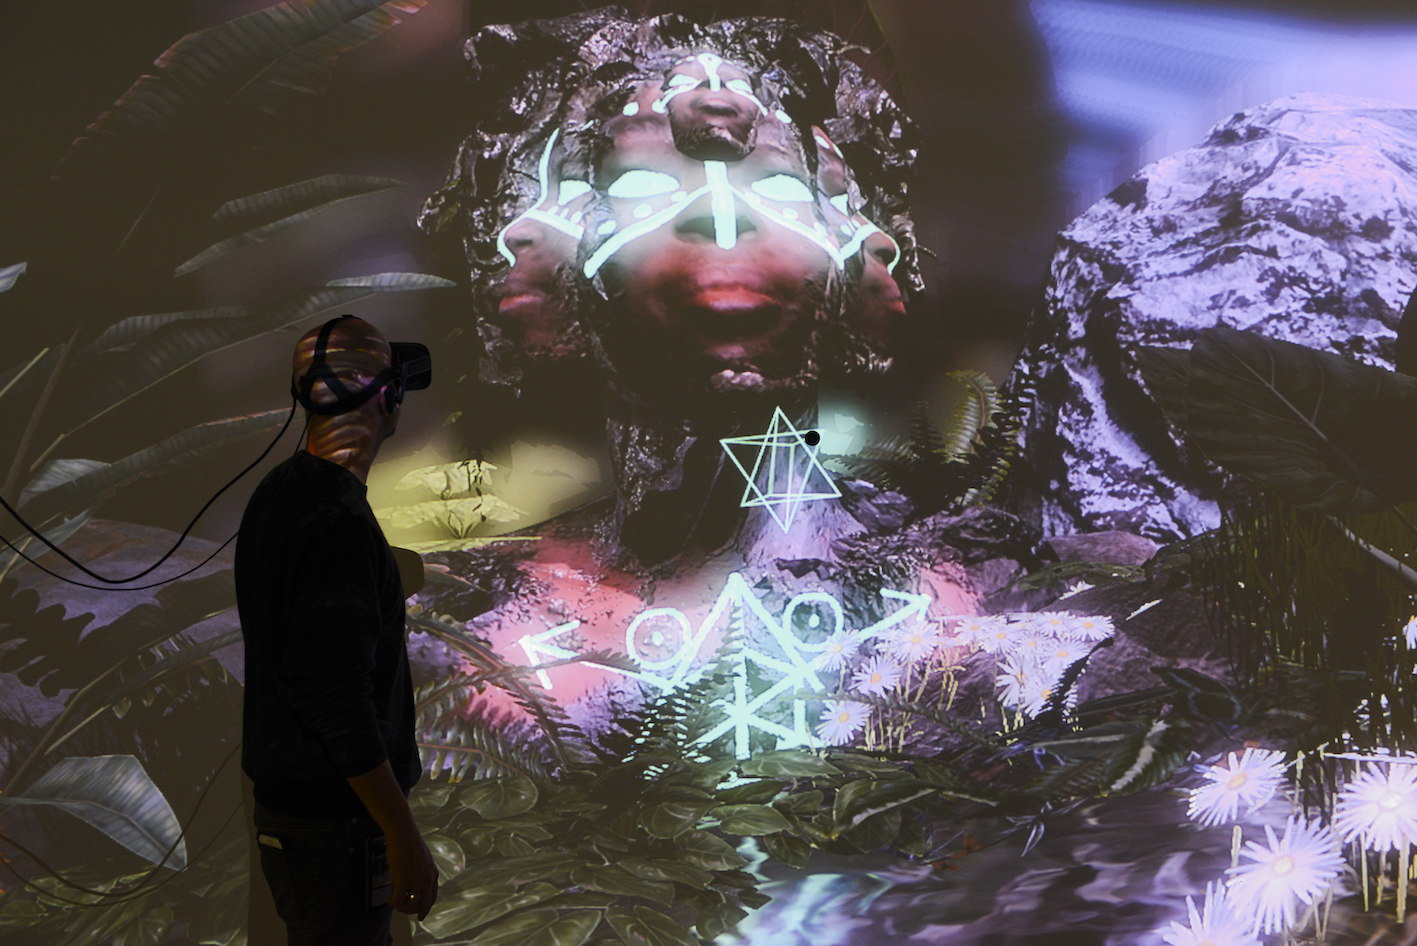 Exhibition view THE UNFRAMED WORLD at HeK Basel, artwork: Alfredo Salazar-Caro, Portrait of Elizabeth Mputu, 2016 (VR experience) / Photo by Franz Wamhof